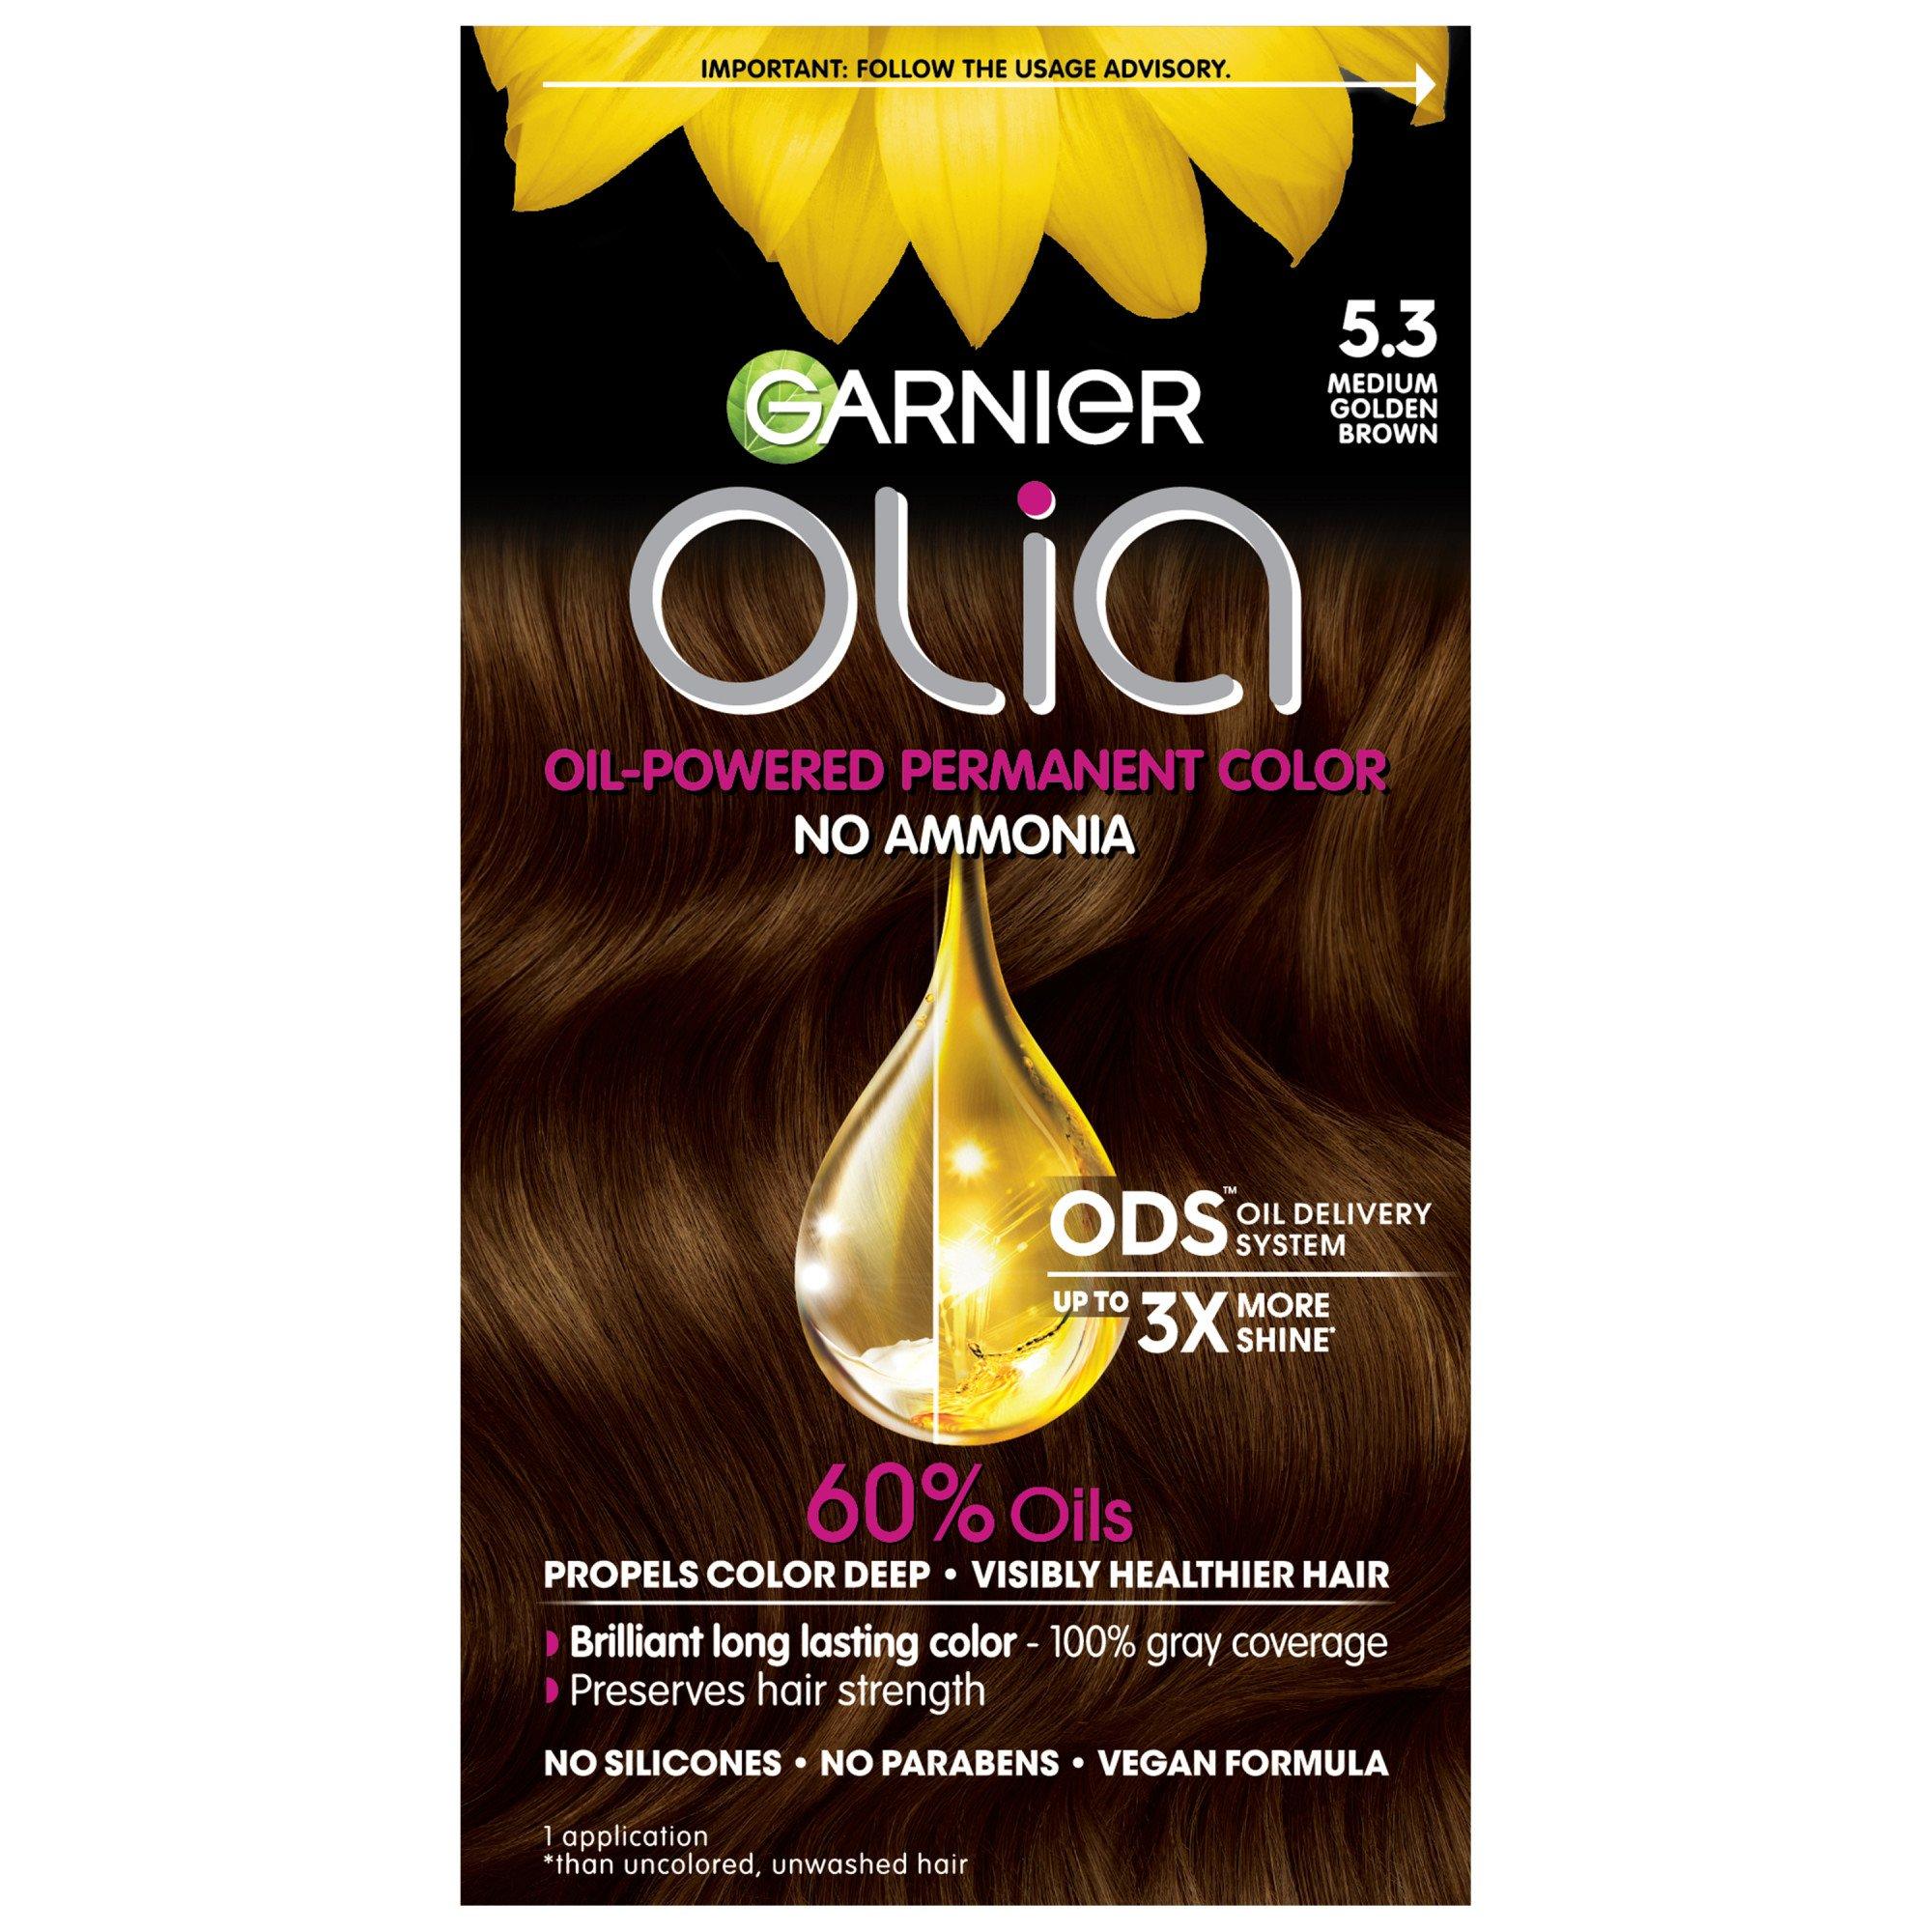 Garnier Olia Oil Powered Permanent Hair Color 53 Medium Golden